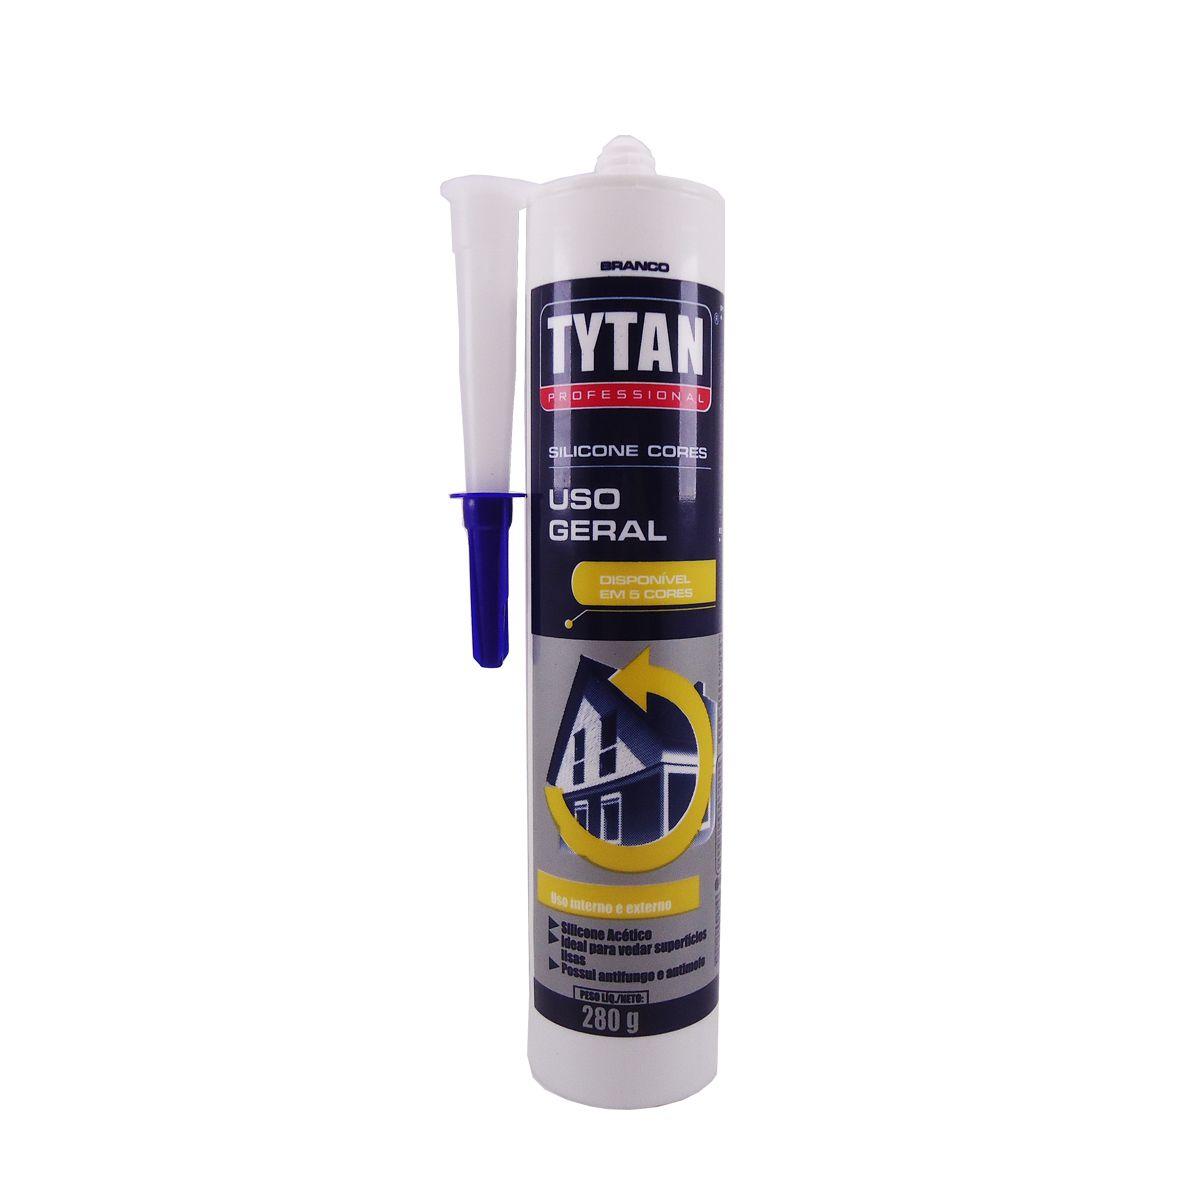 Veda Calhas Uso Geral Branco 280g Tytan